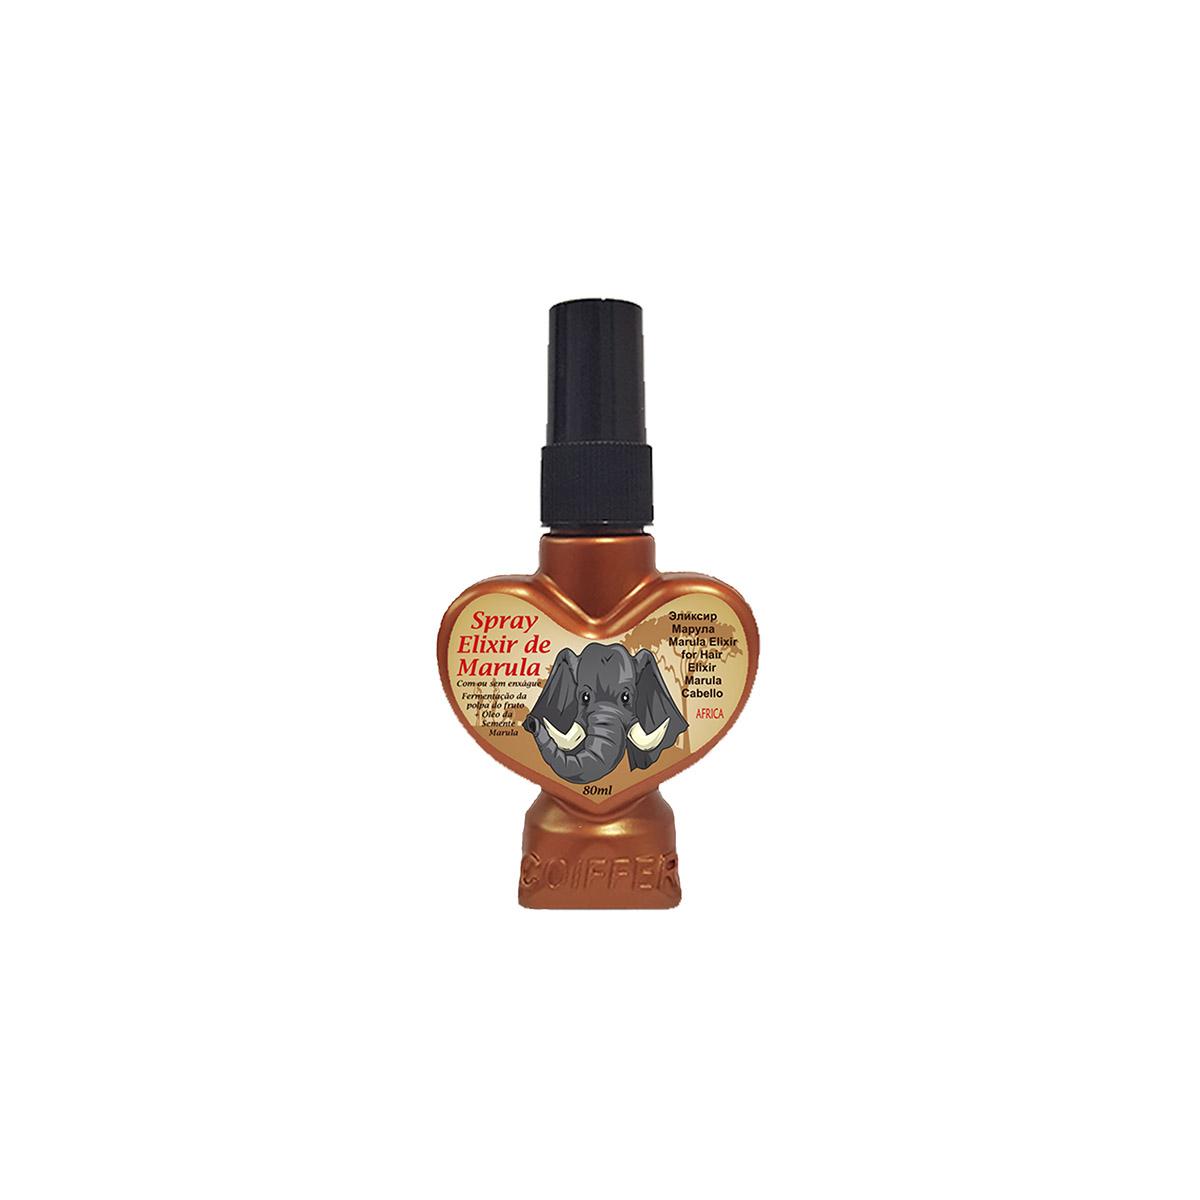 Finalizador para cabelos  Elixir Black Rose Coiffer 80ml